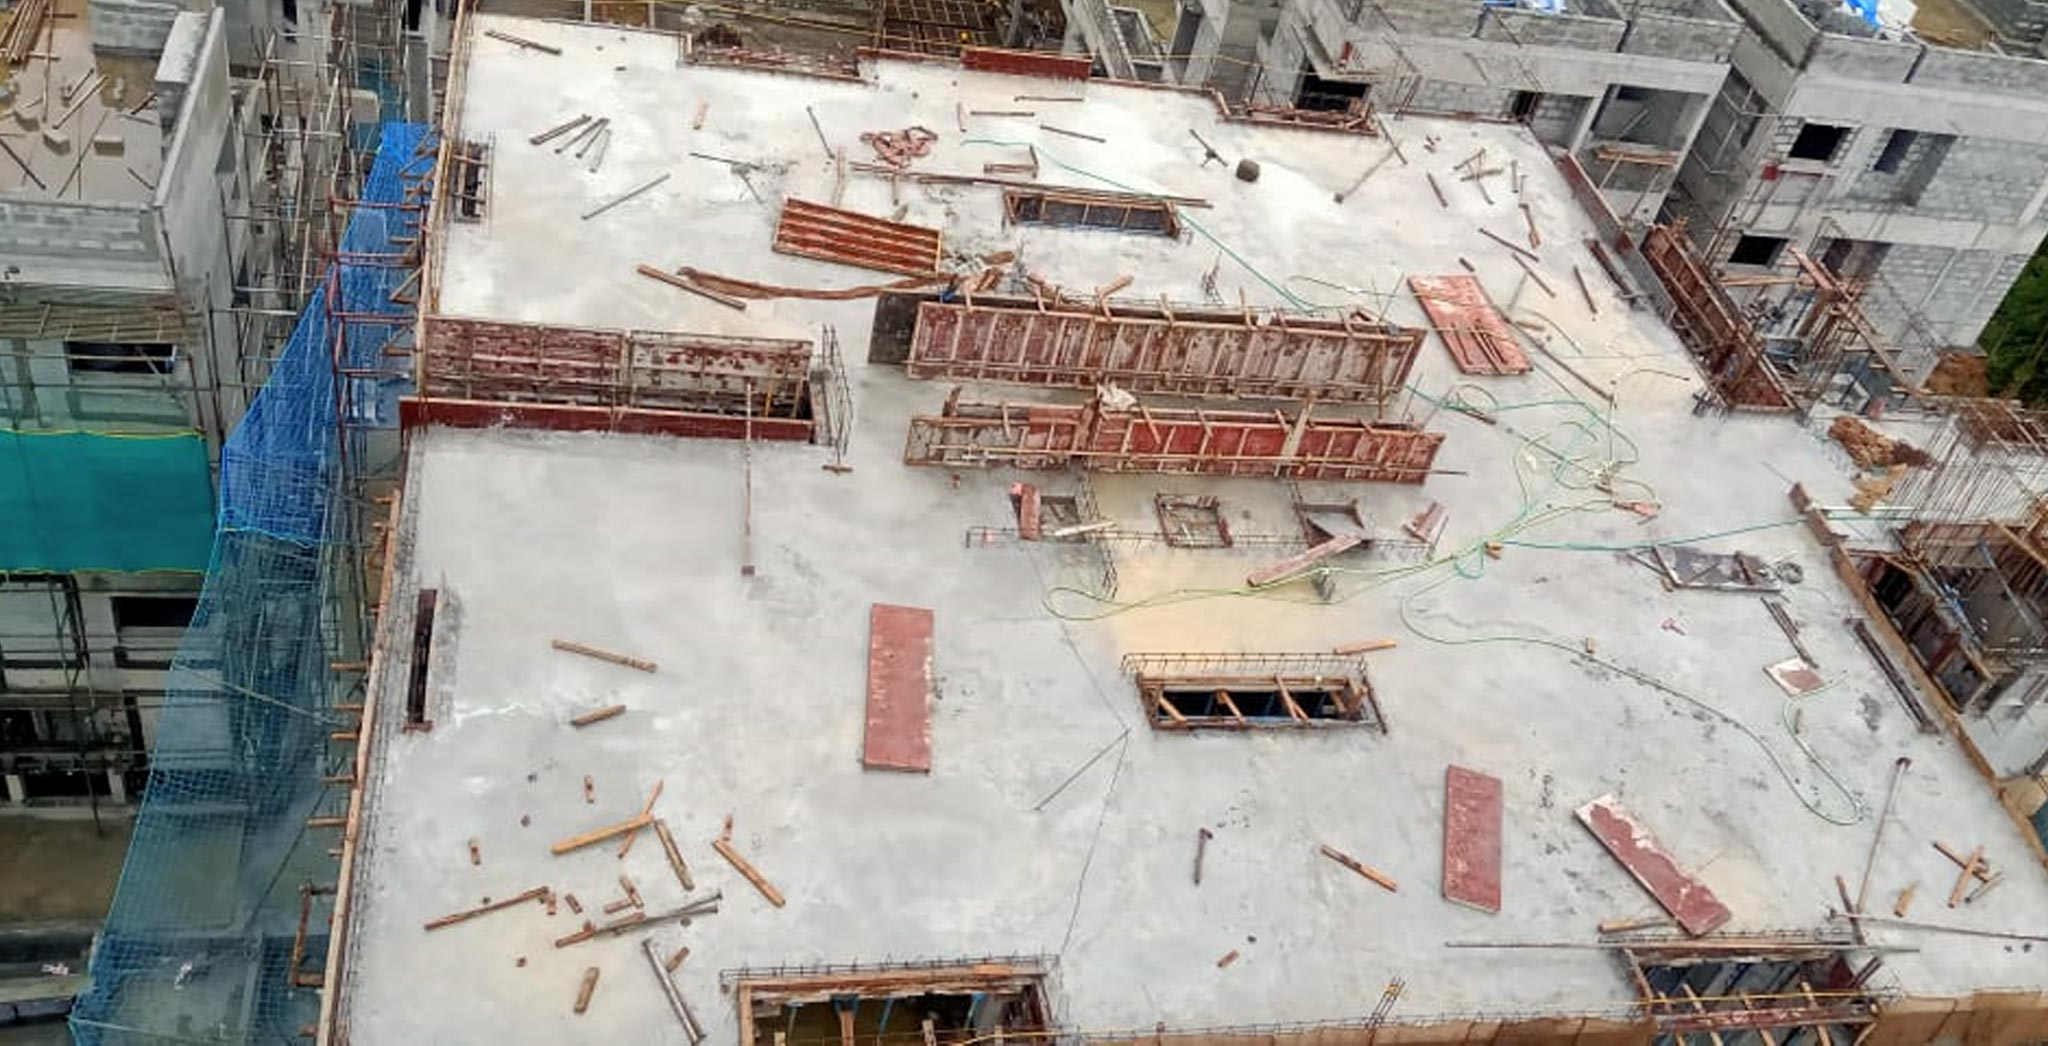 Jul 2021 - Block S - On Casting of Terrace Floor slab